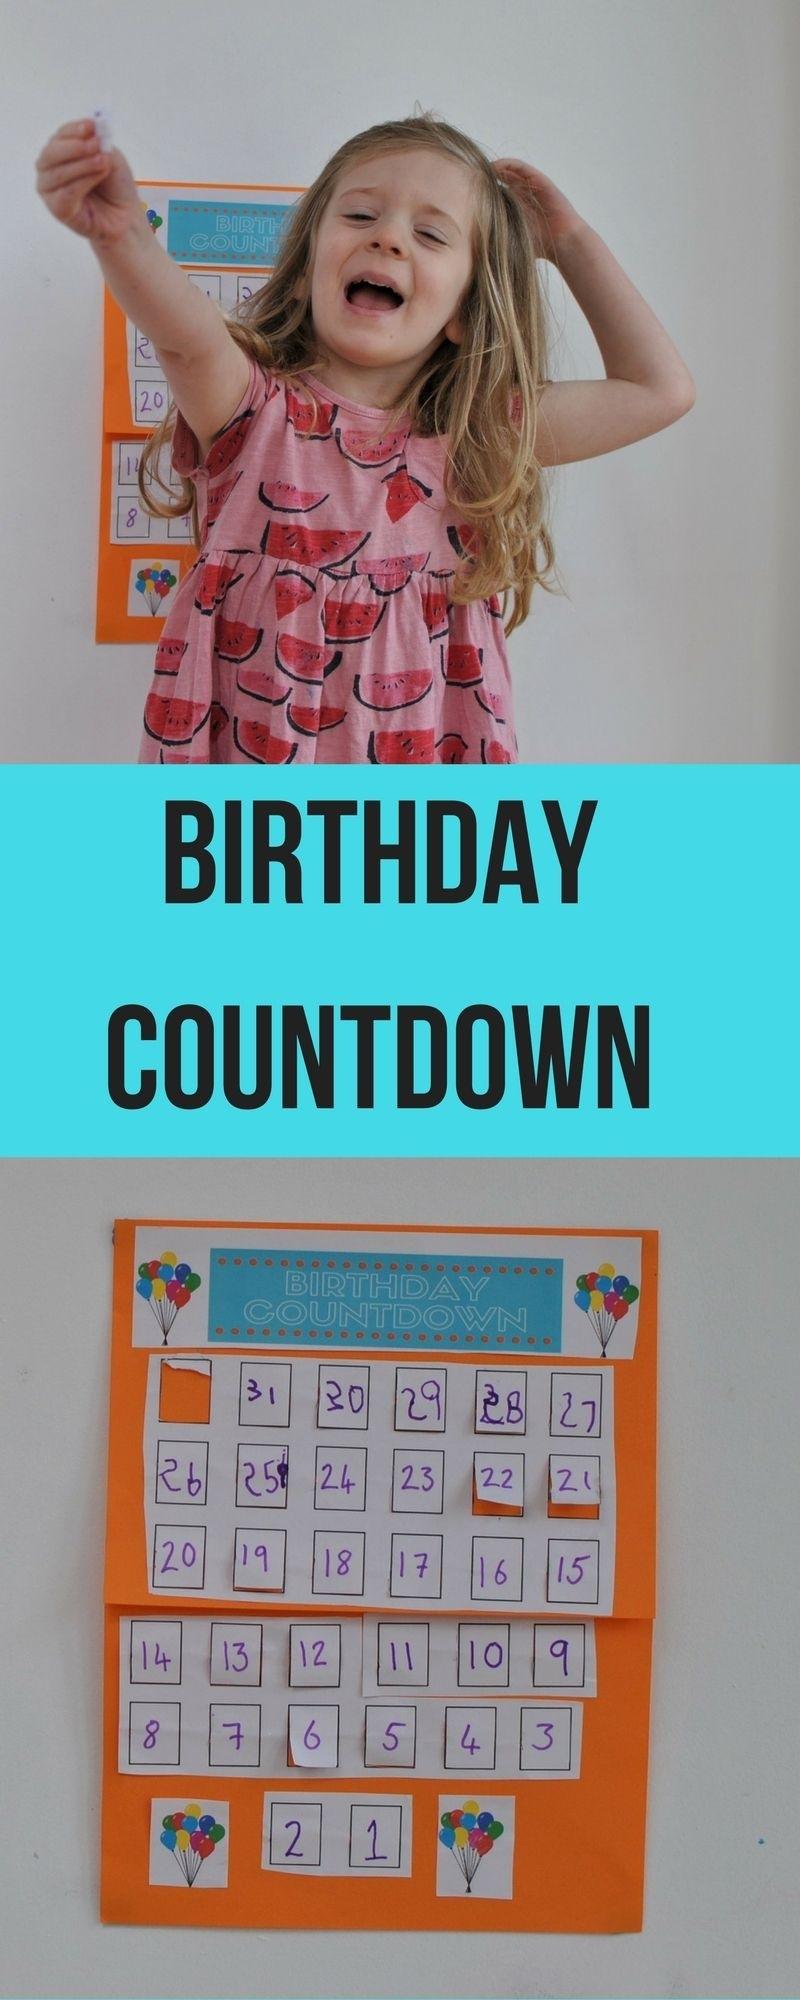 Making A Birthday Countdown Calendar | Craft Ideas For The Little_Countdown Calendar To My Birthday